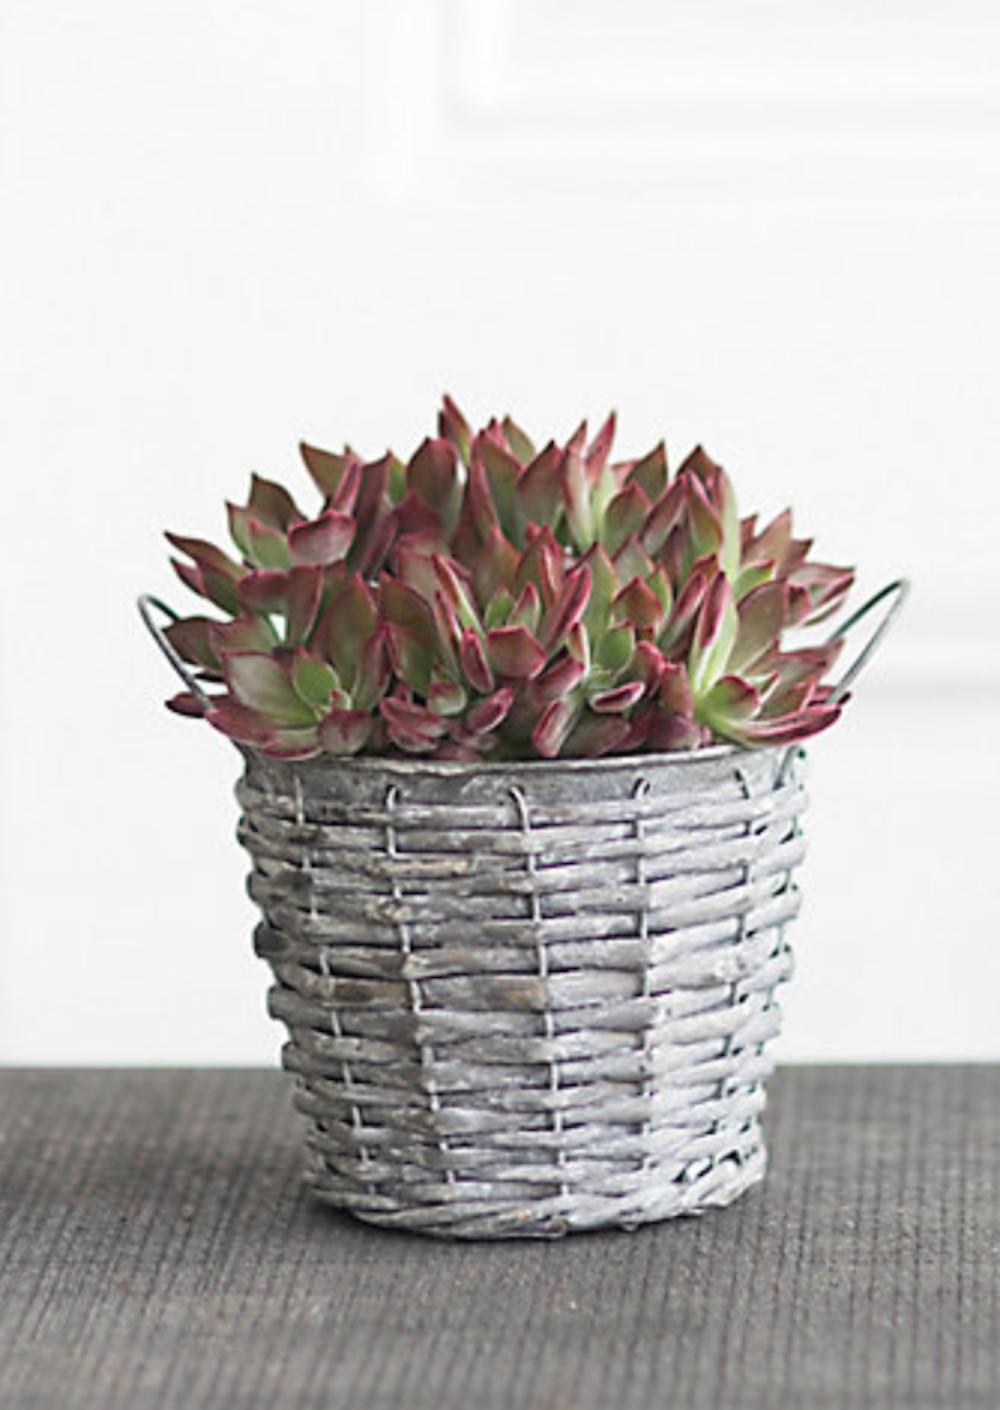 13 Best Indoor Succulents to Grow Now! Devotion Echeveria #Succulents #Garden #Gardening #HousePlants #Decor #HomeDecor #GrowYourOwn #Affordable #DIY #BudgetFriendly #EasyToGrow #EasyToMaintain